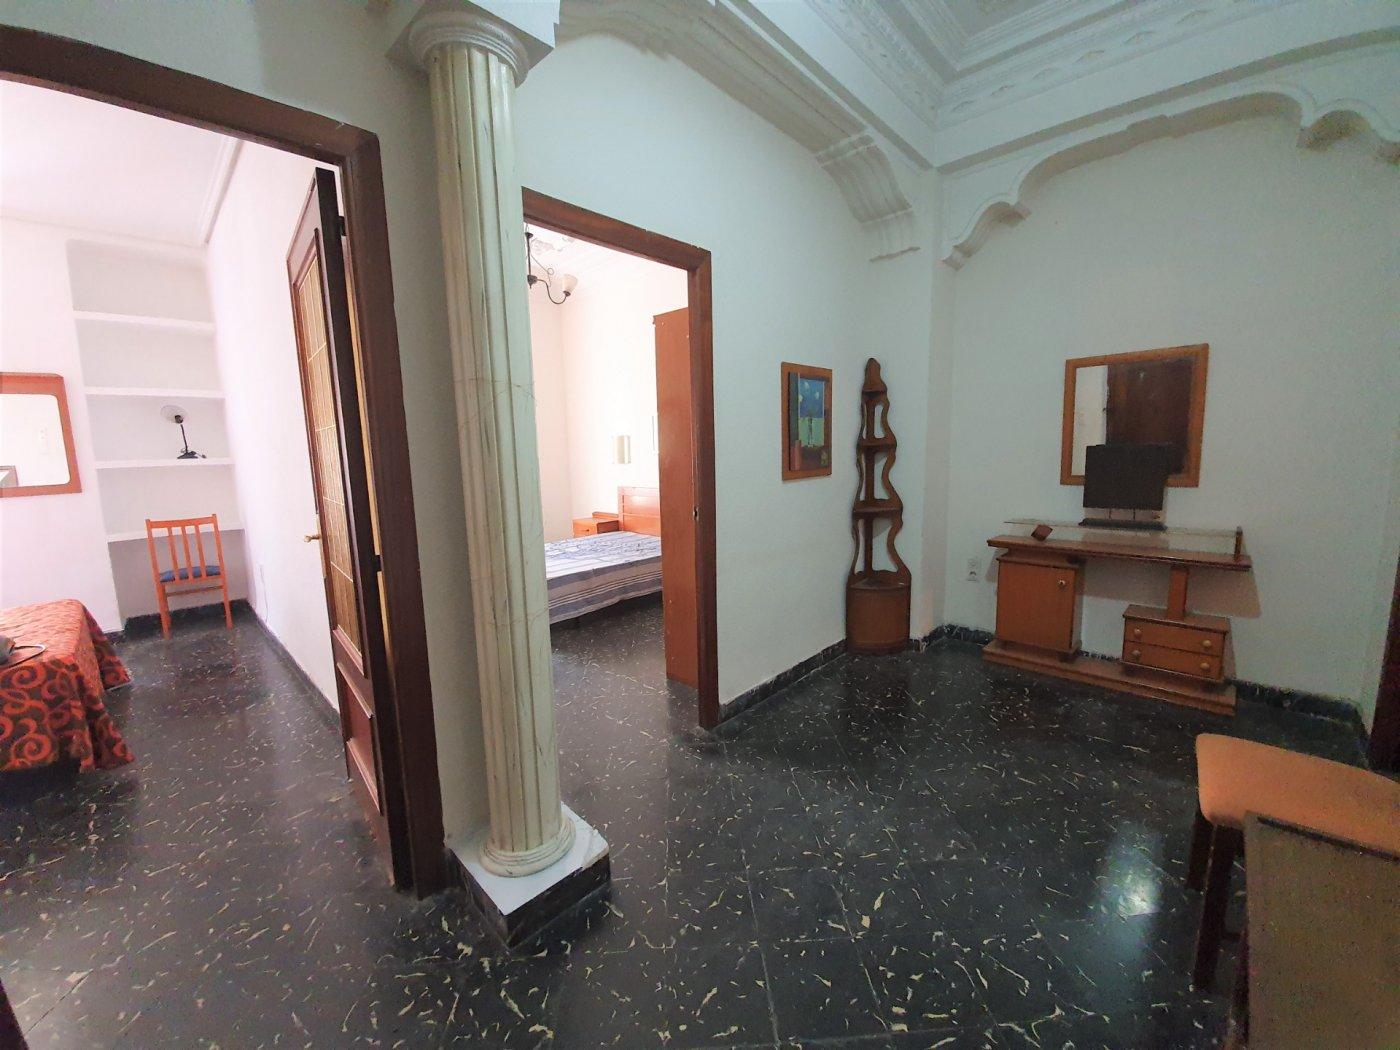 Apartamento, La Raiosa, Venta - Valencia (Valencia)